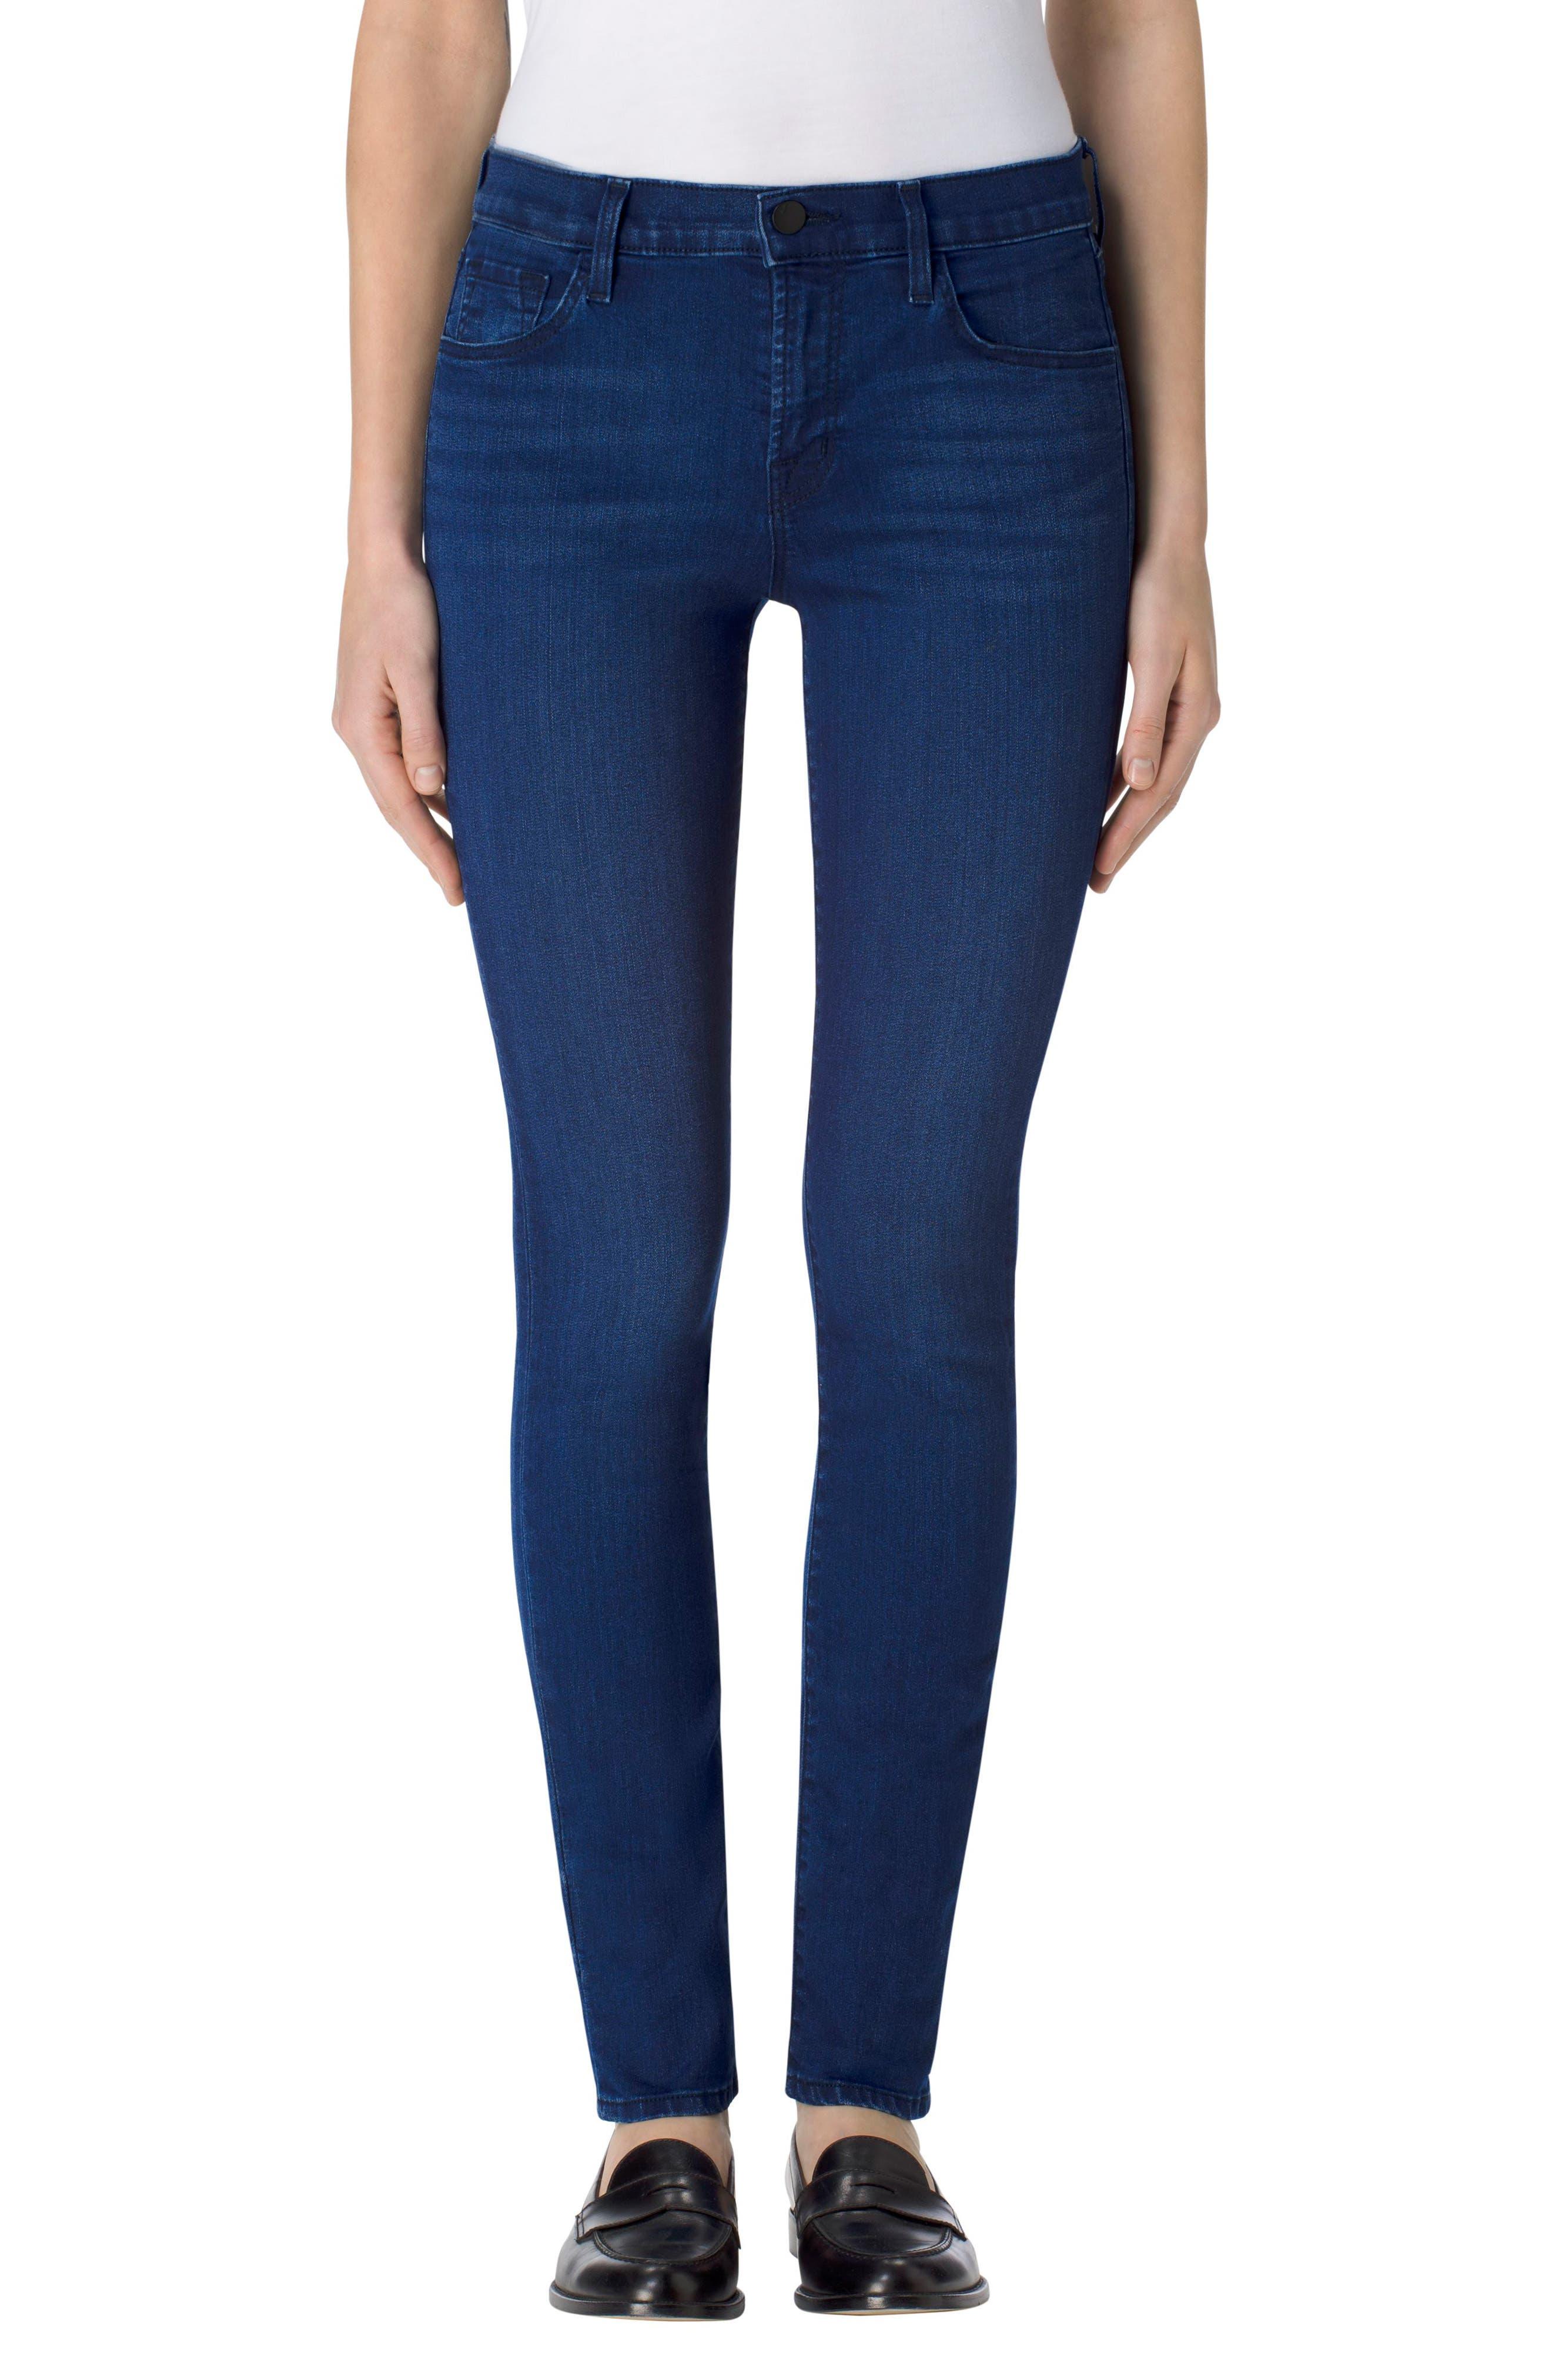 Alternate Image 1 Selected - J Brand '811' Ankle Skinny Jeans (Sway)